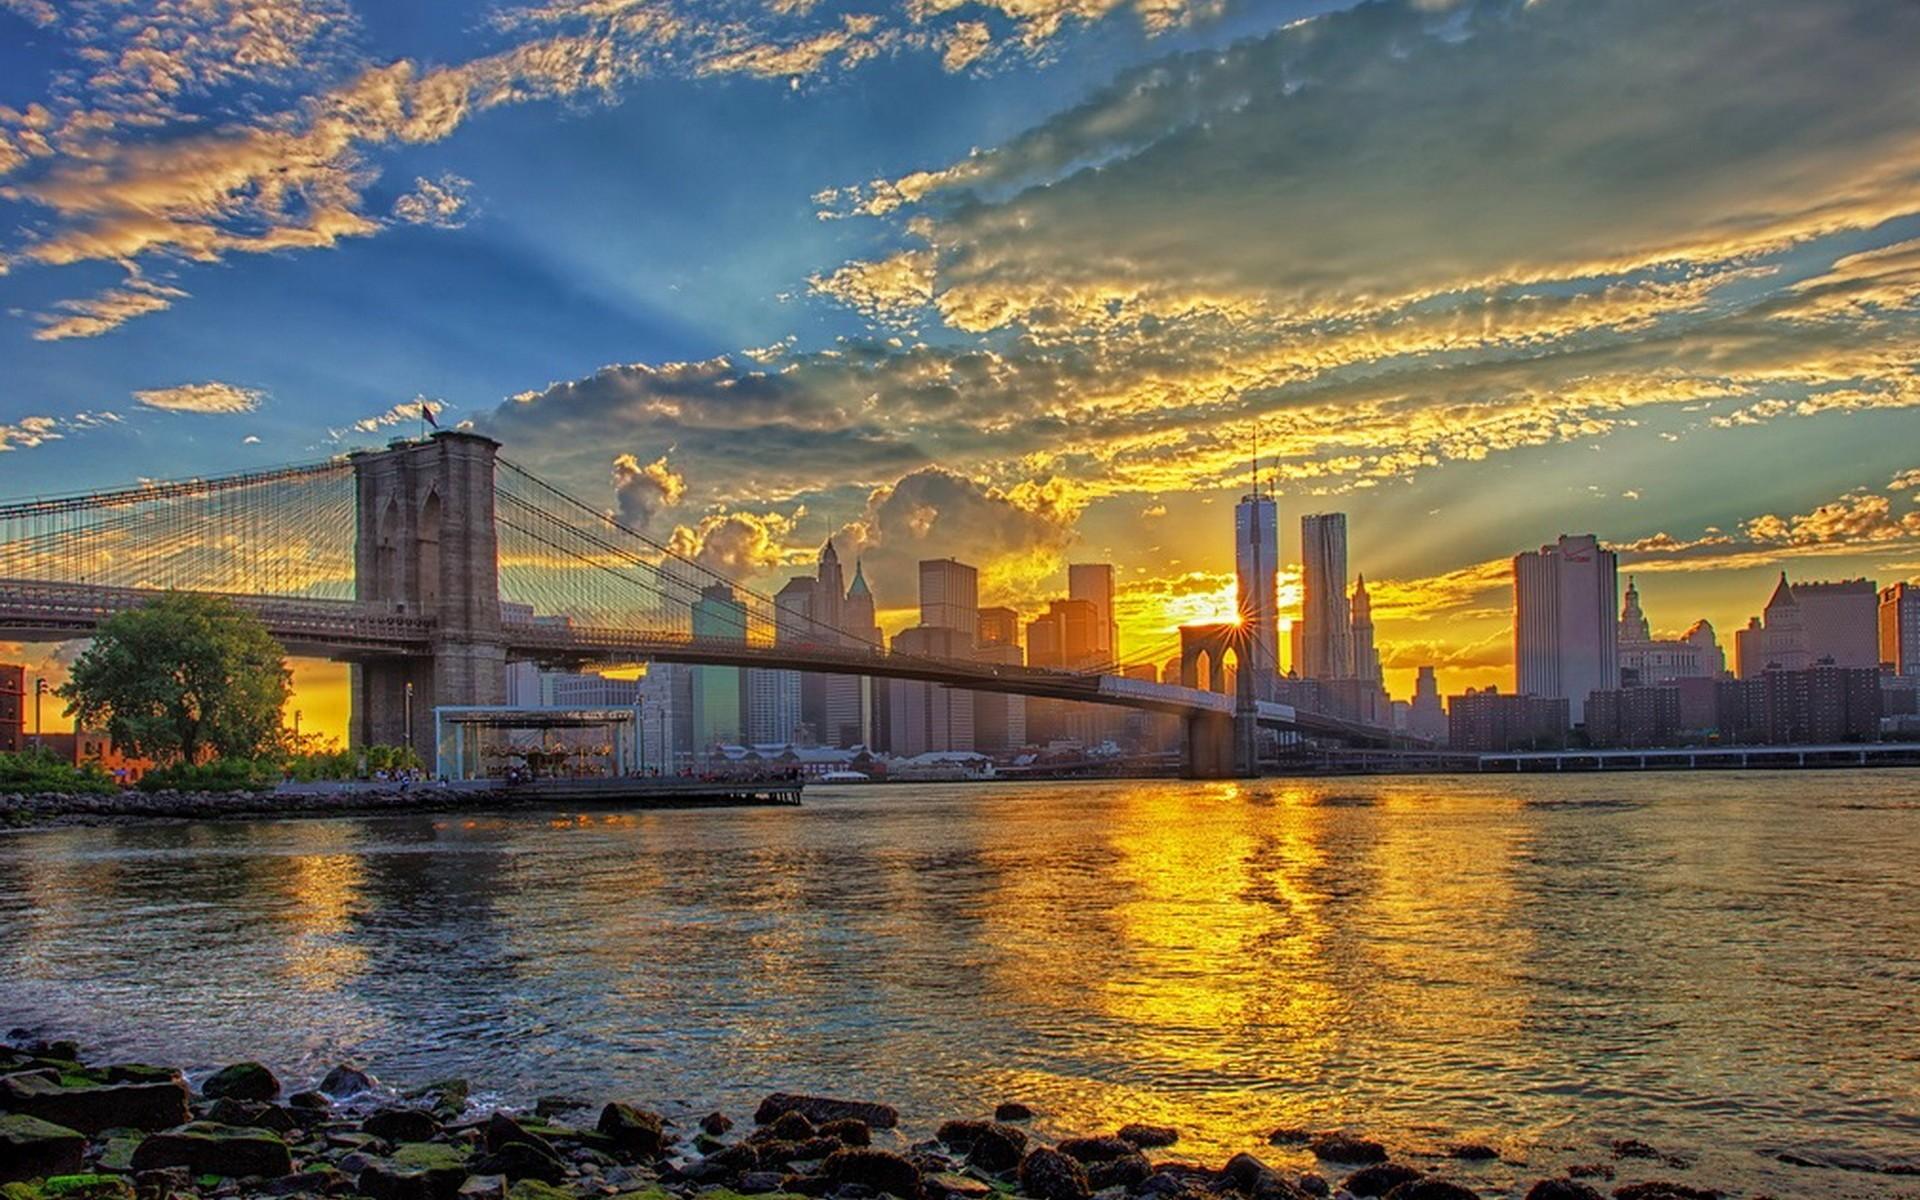 Brooklyn Bridge Wallpaper (76+ Images